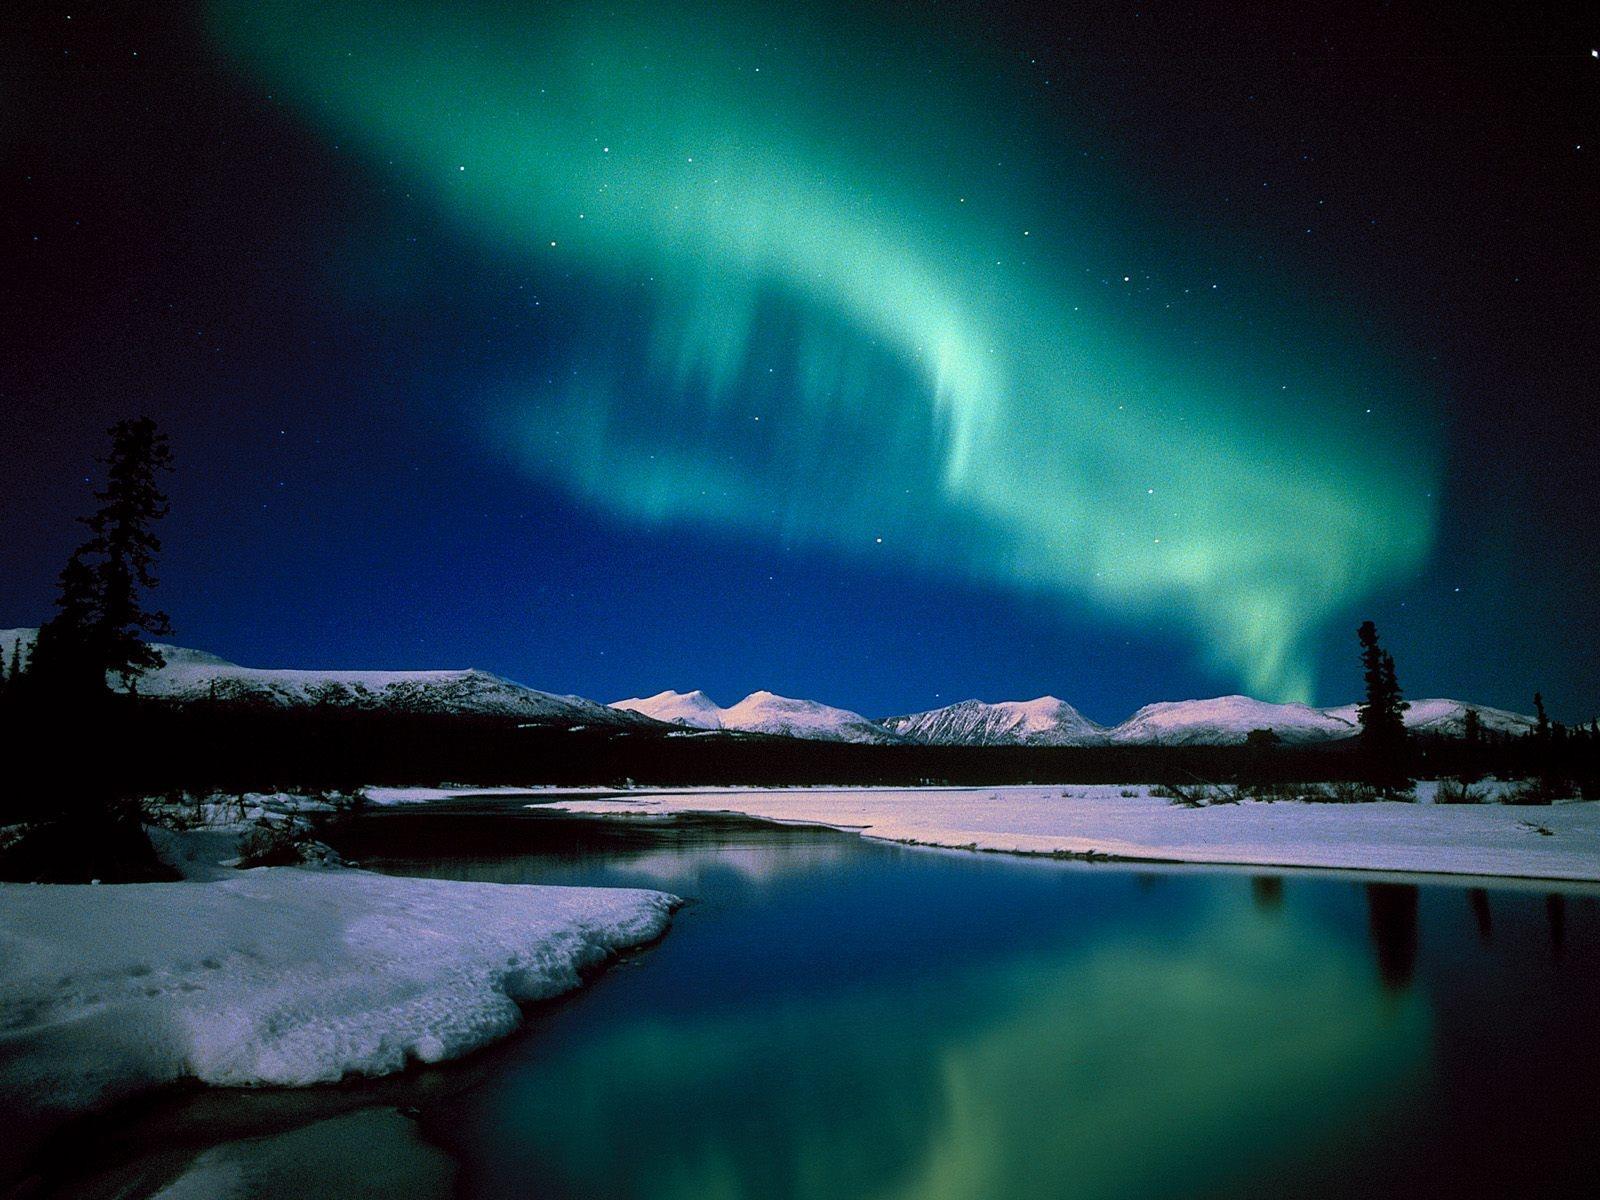 Fascinantes aurores boréales